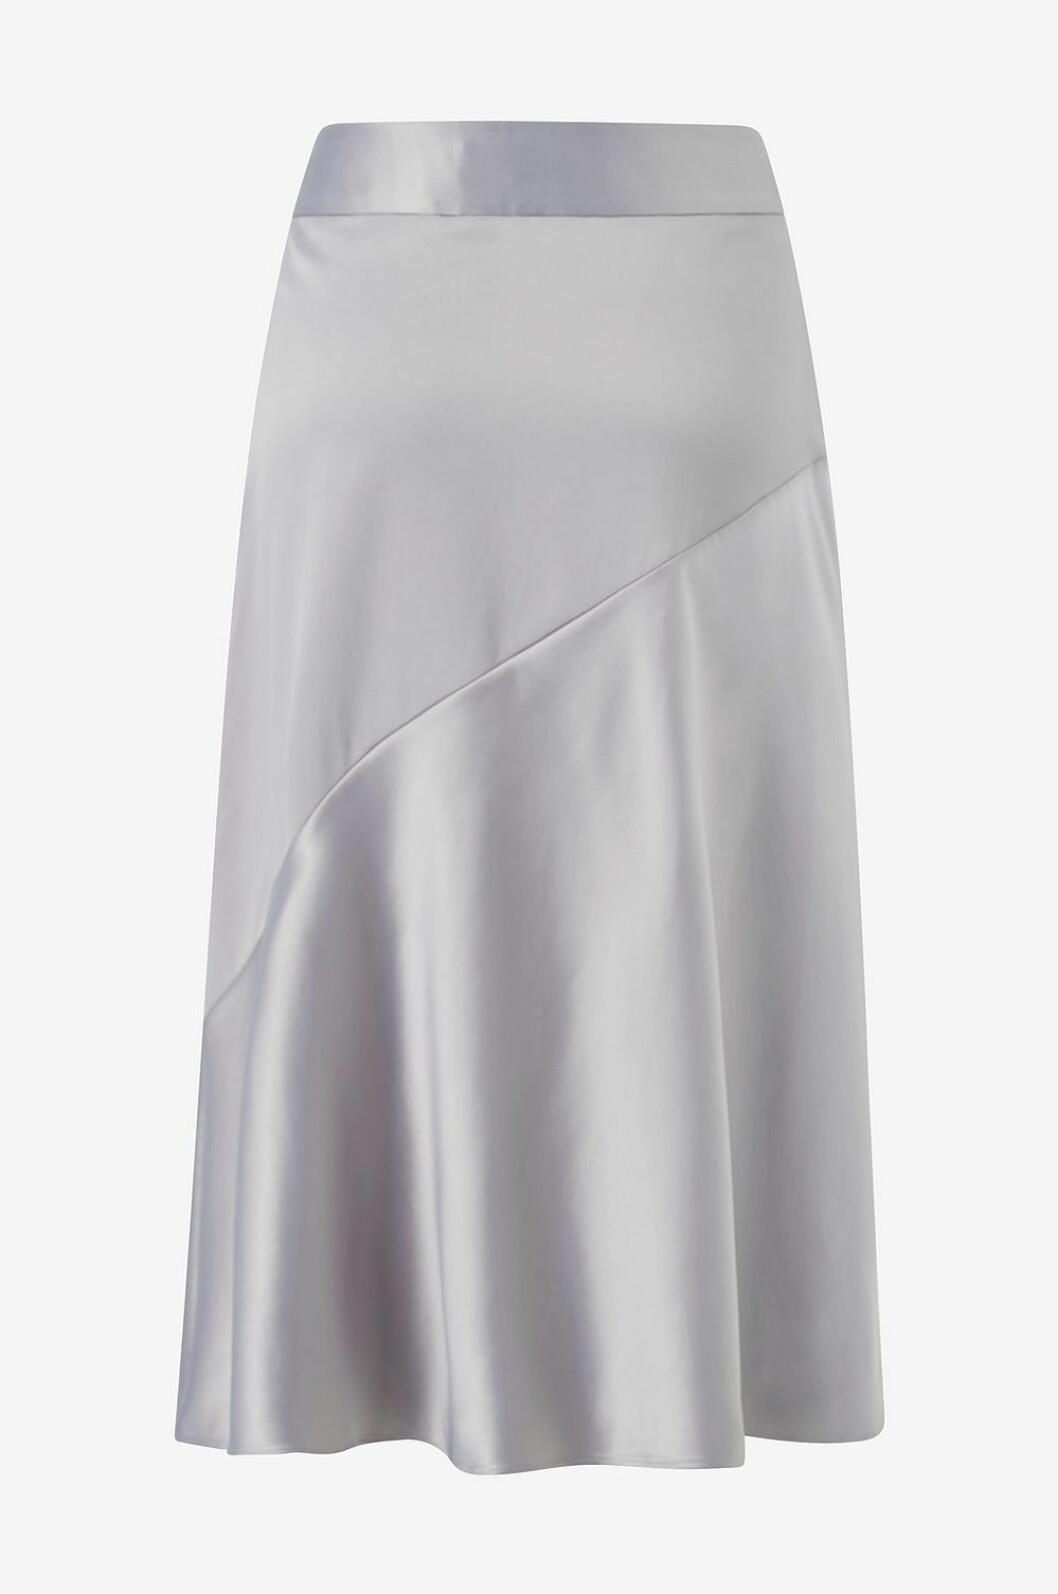 Matchande set: Silverfärgad kjol